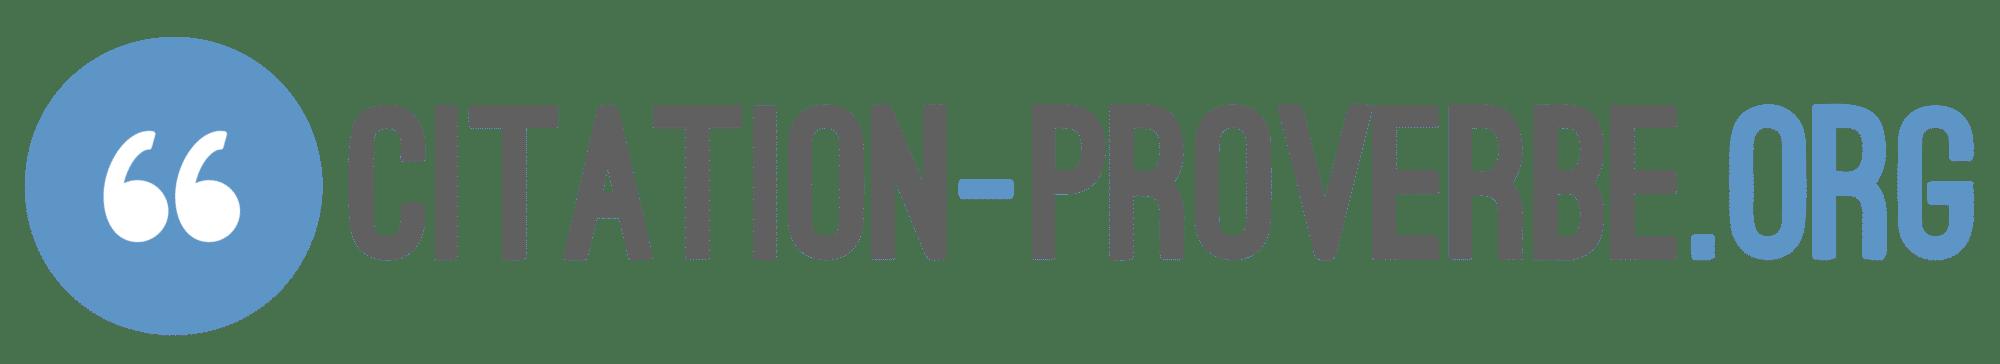 Citation-proverbe.org